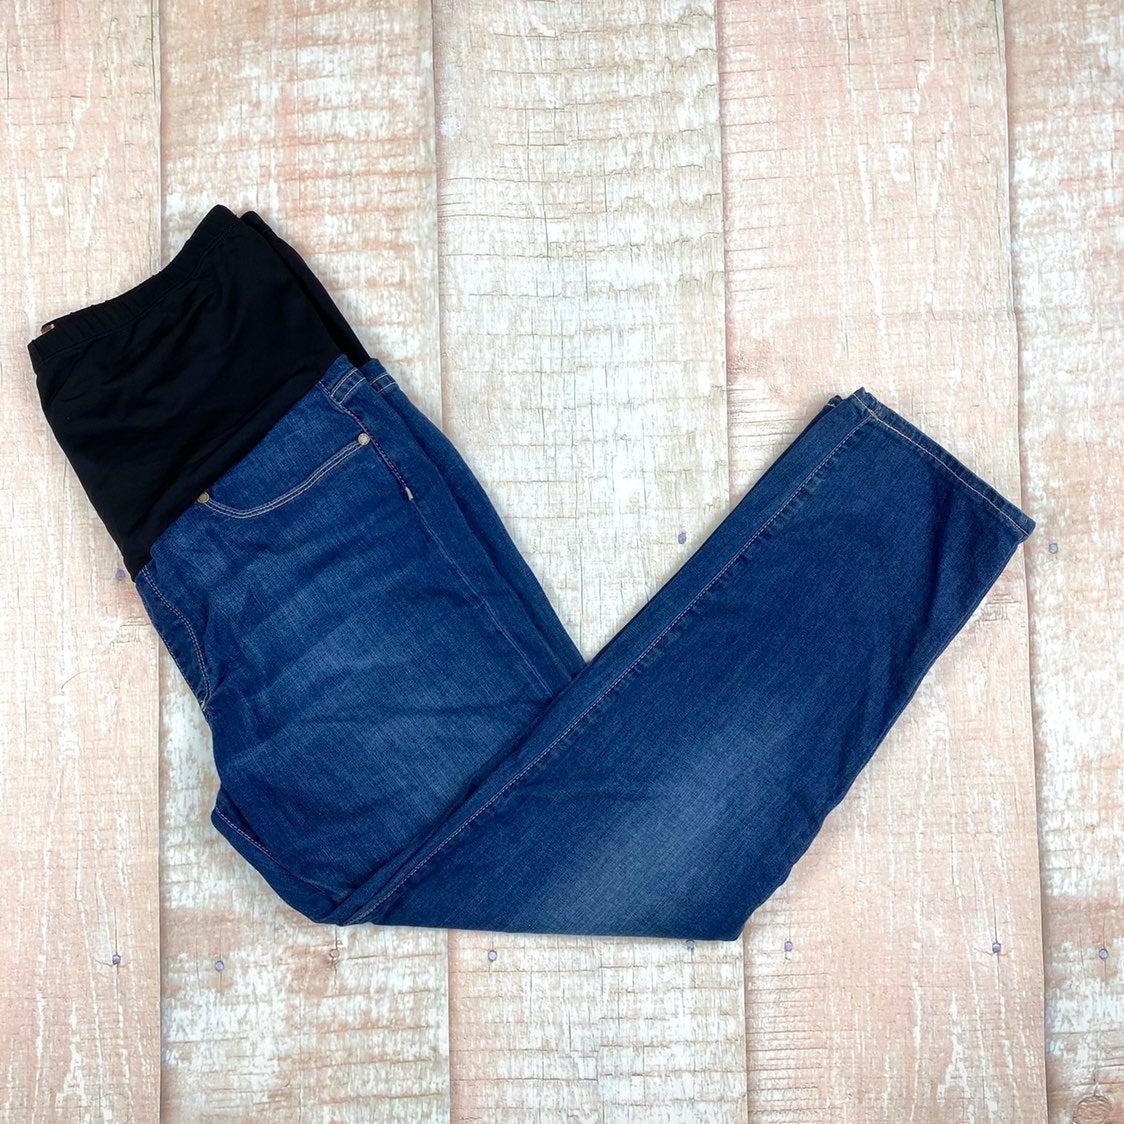 Paige Denim Maternity Jeans- Medium Wash